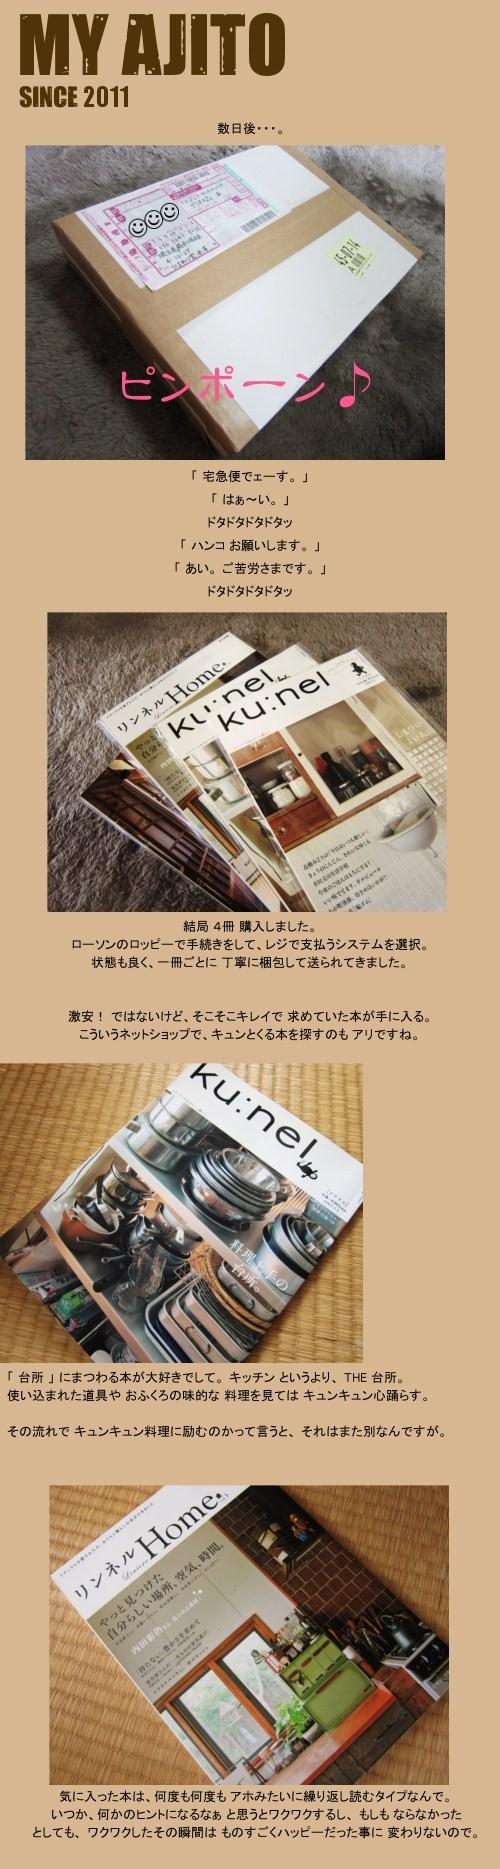 kyun_2.jpg